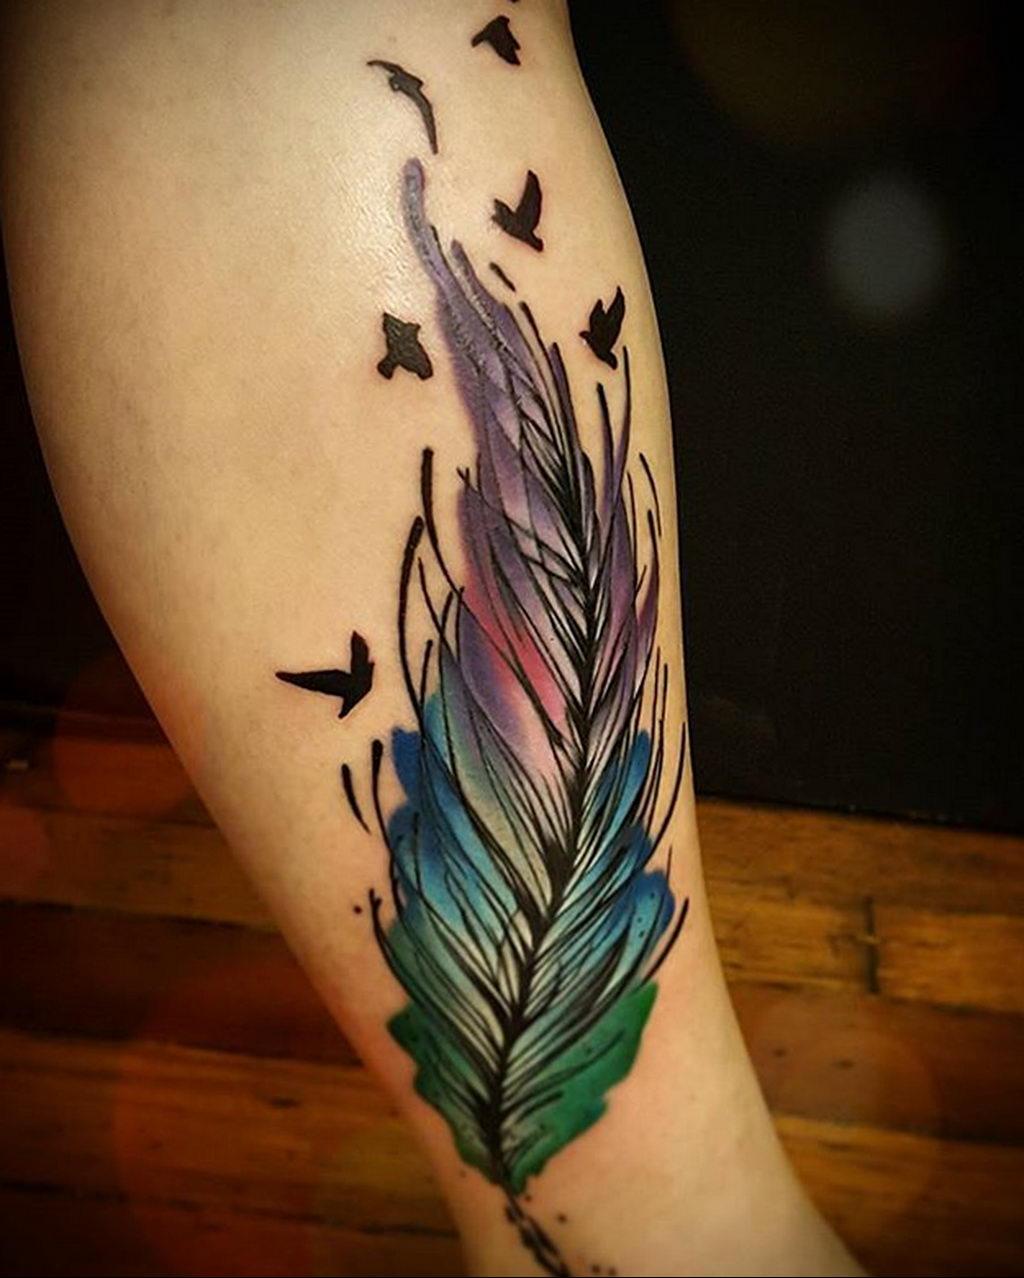 Фото тату про любовь рисунок Перо 03.02.2020 №064 -tattoo feather- tatufoto.com